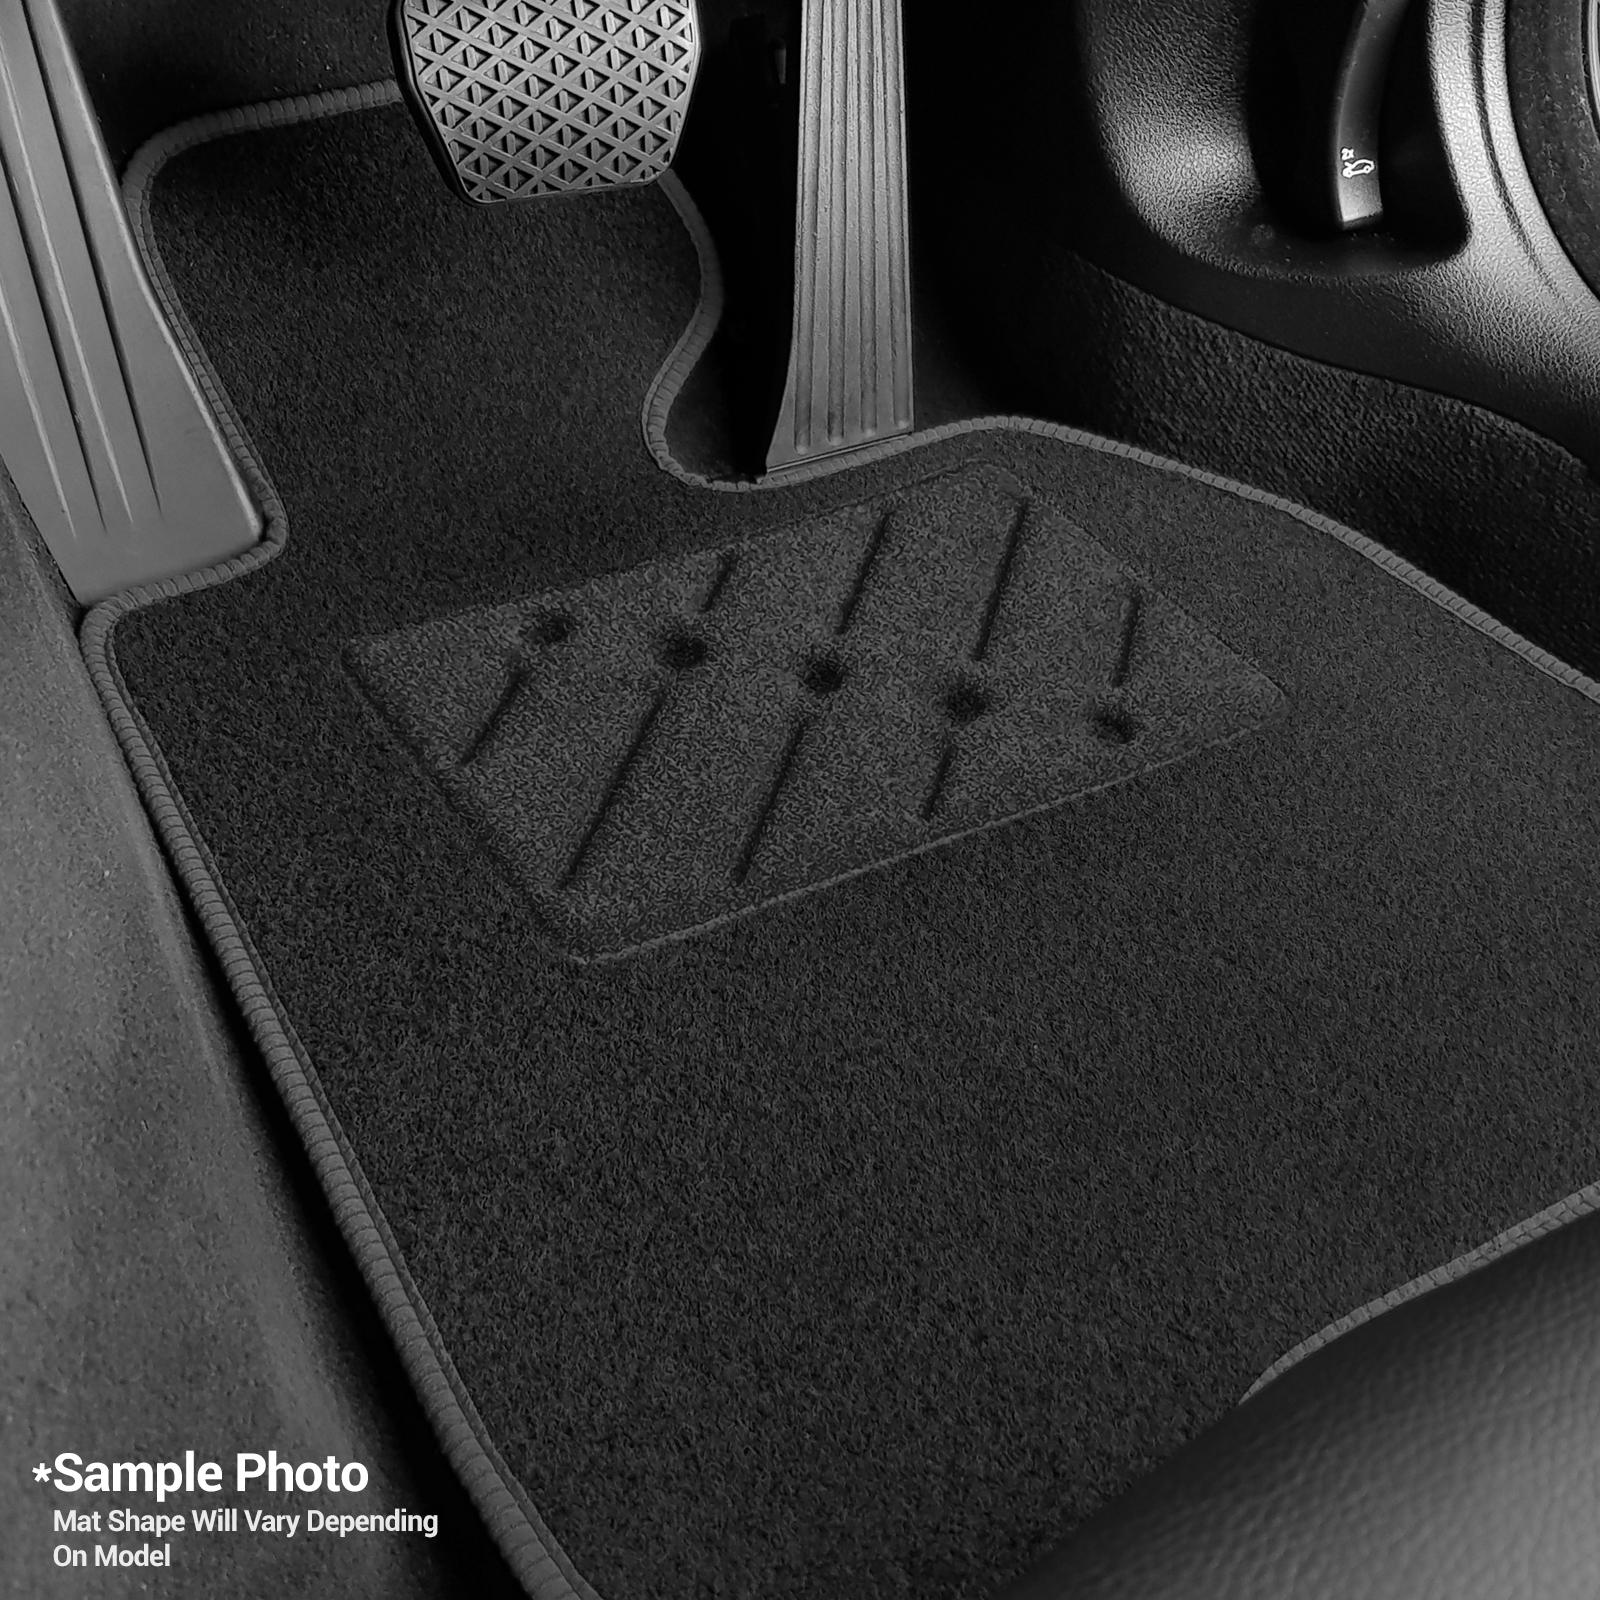 Seat-Tarraco-Car-Mats-2019-Tailored-amp-Heel-Pad-A thumbnail 2